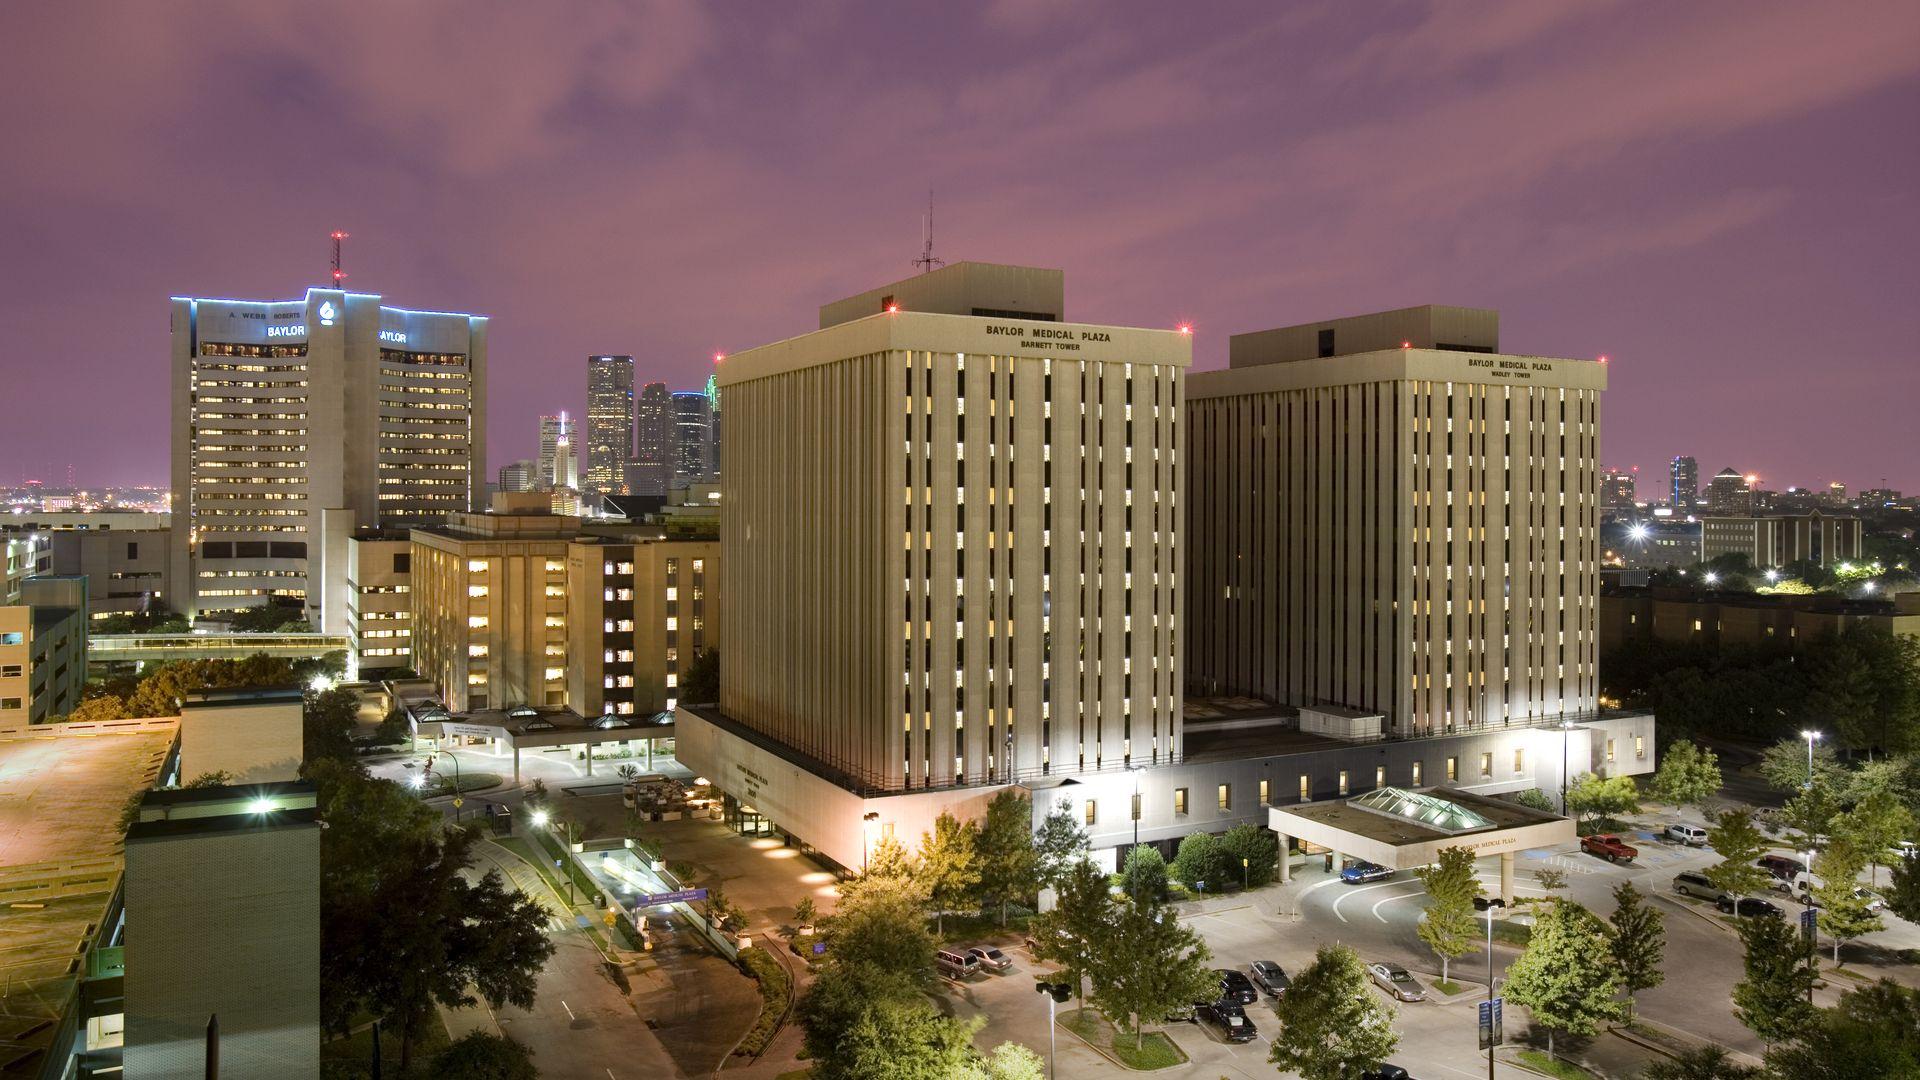 Baylor University Medical Center hospital campus in Dallas.